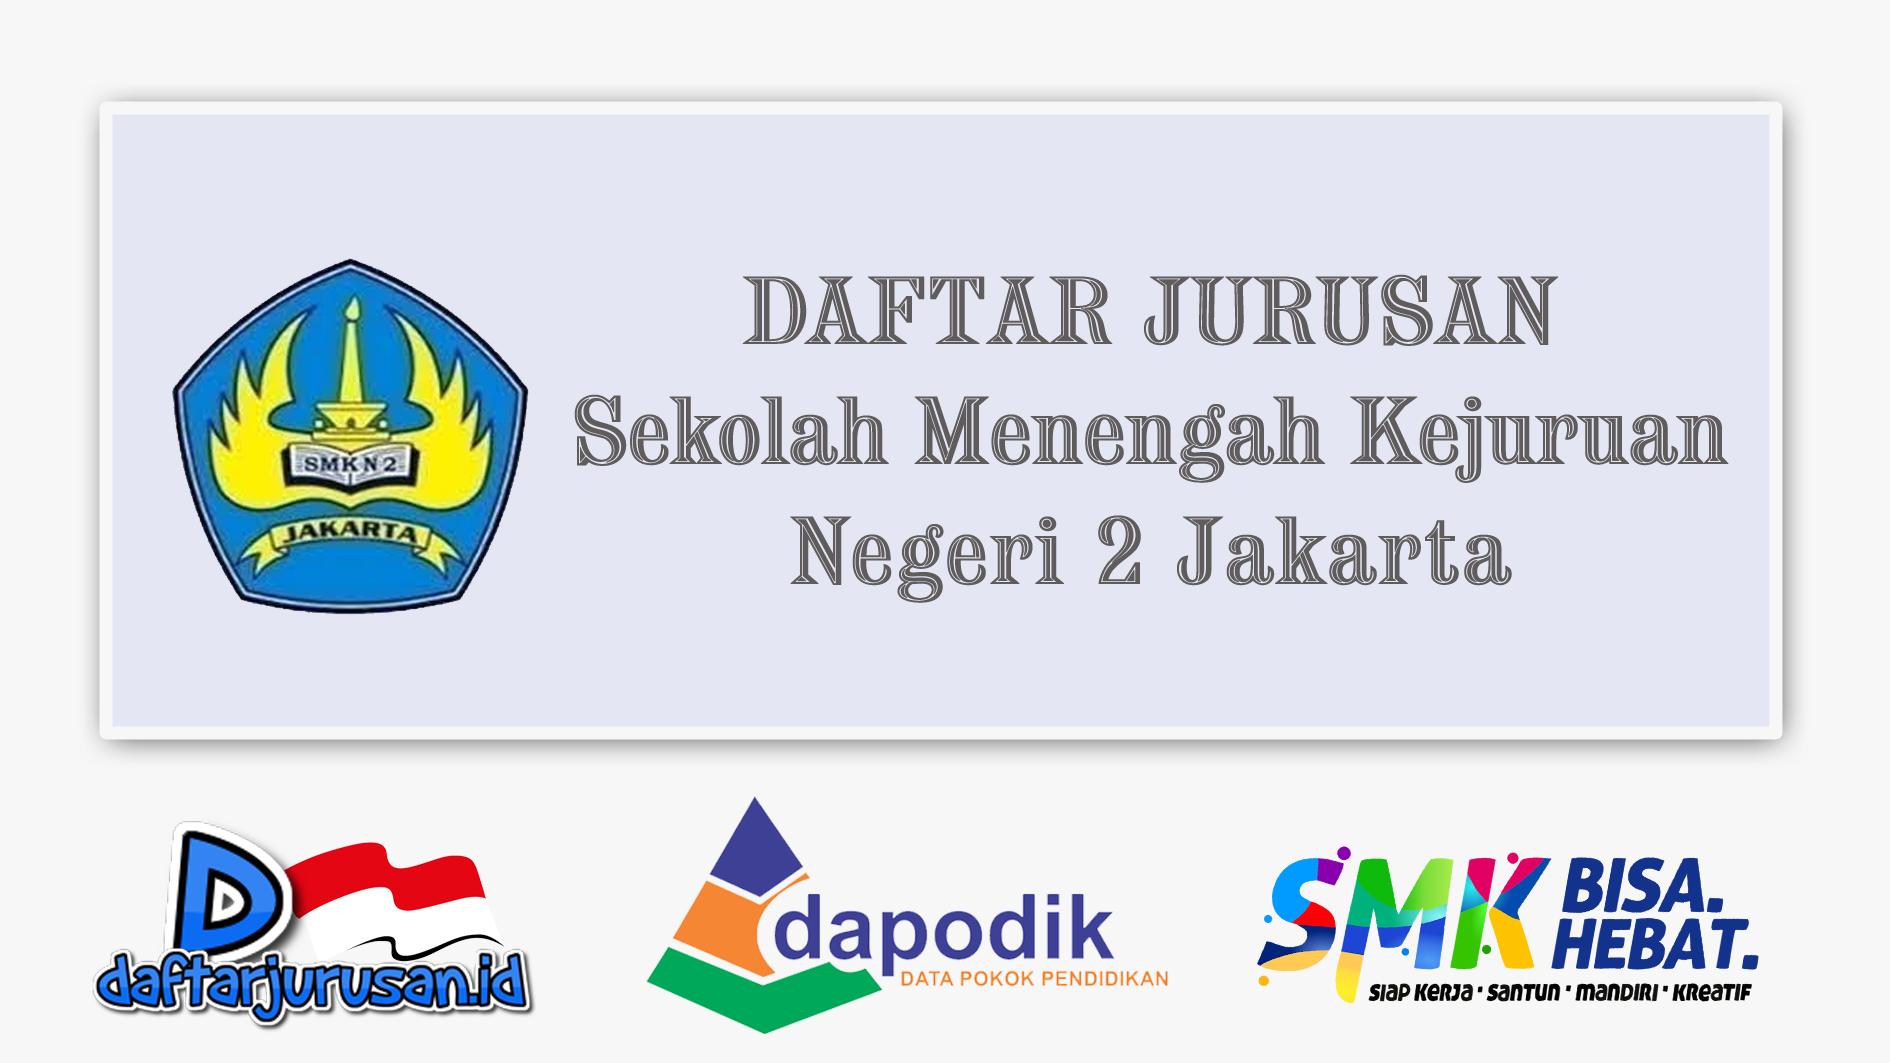 Daftar Jurusan SMK Negeri 2 Jakarta Pusat